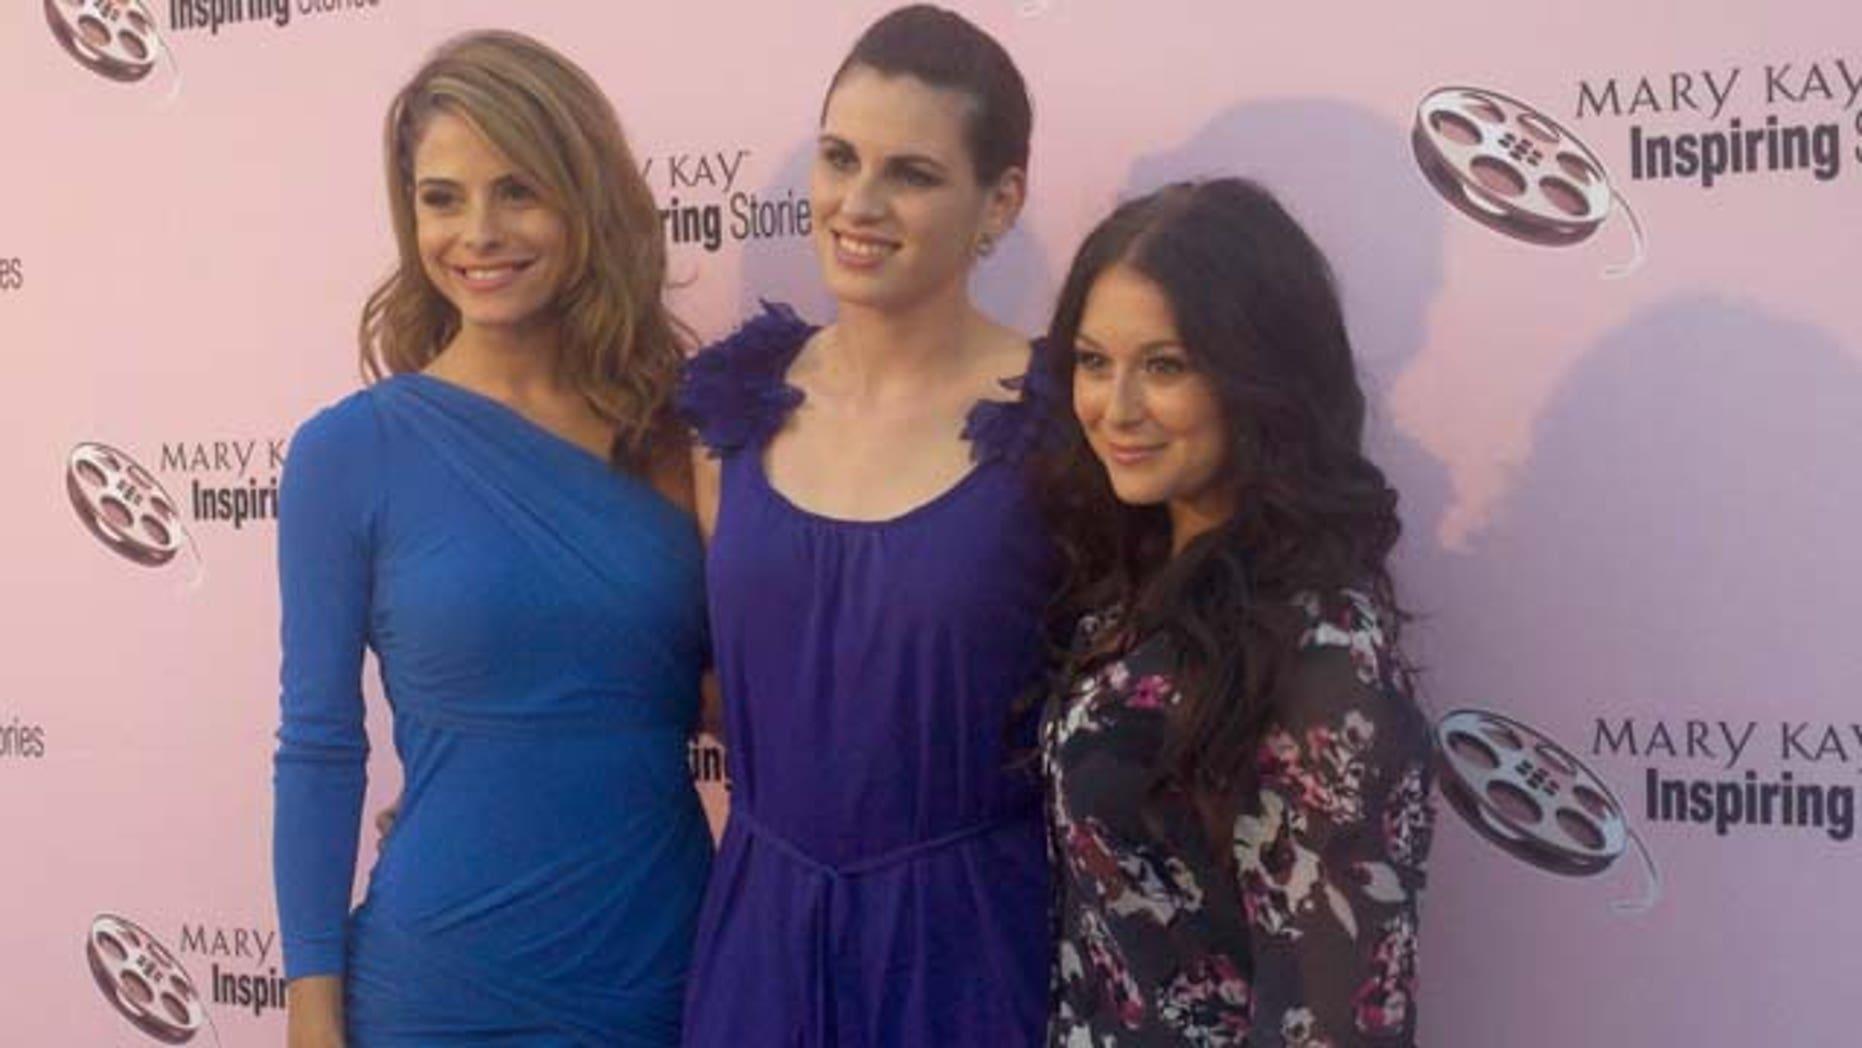 Sept. 29, 2011: Actresses Maria Menounos, Ada Alvarez and Alexa Vega attend Mary Kay's Inspiring Stories event on Thursday to fight domestic violence.